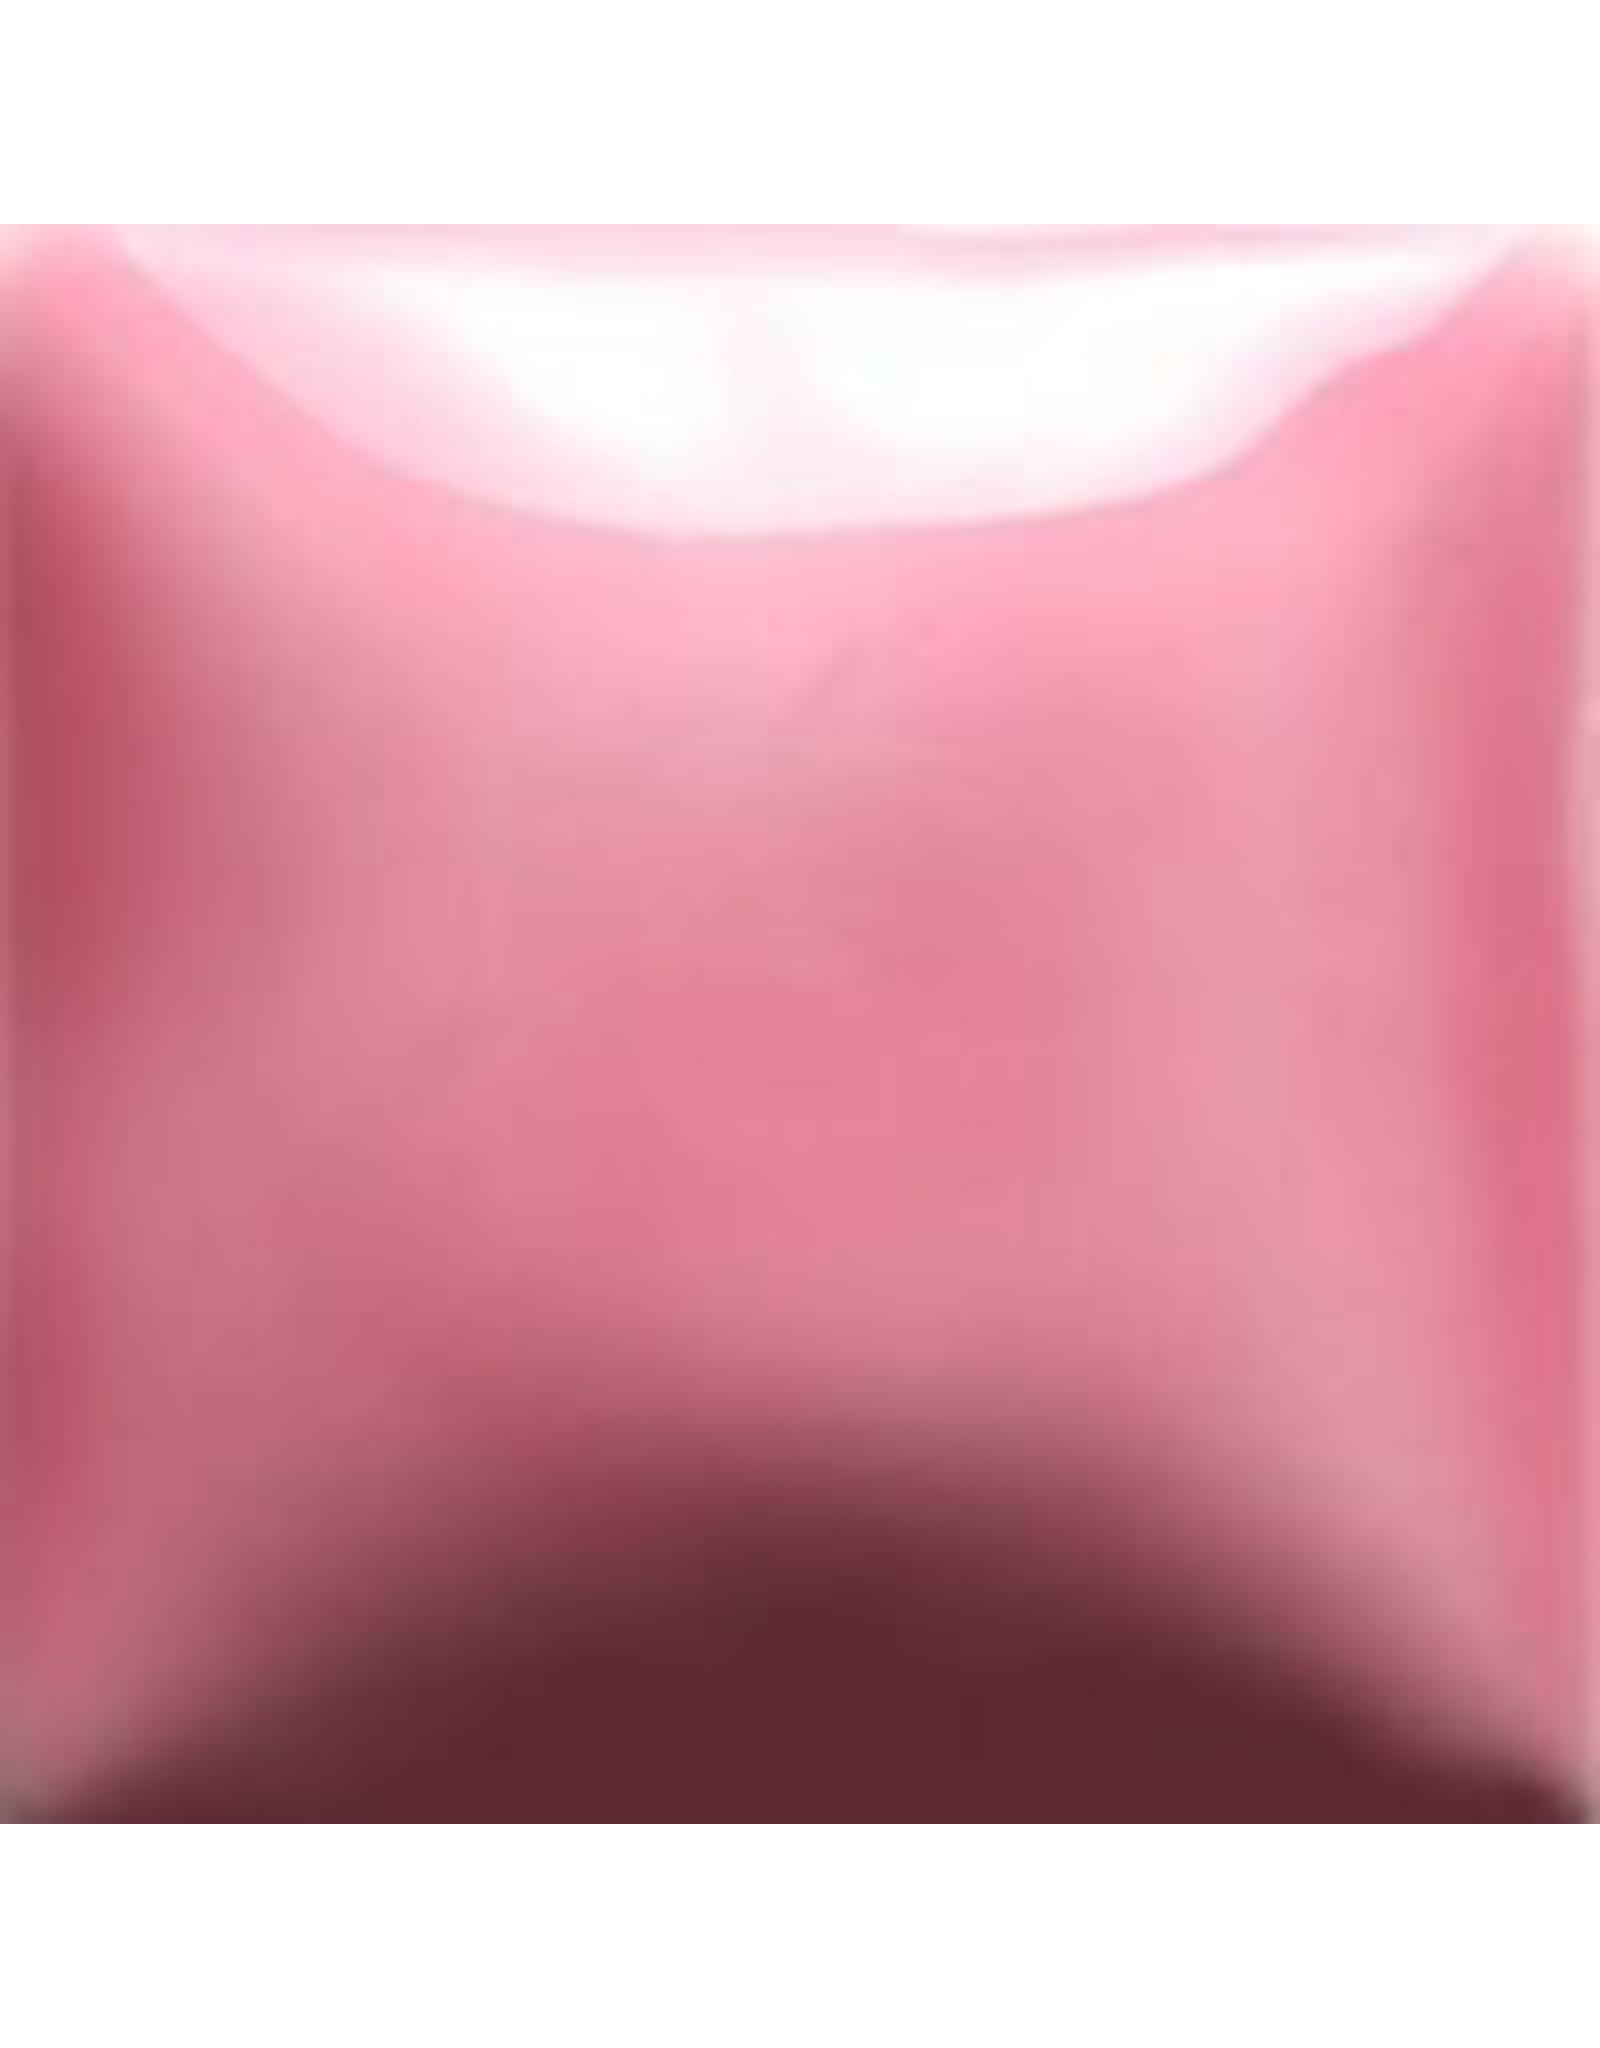 Mayco Mayco Foundations Bright Pink - 118ml